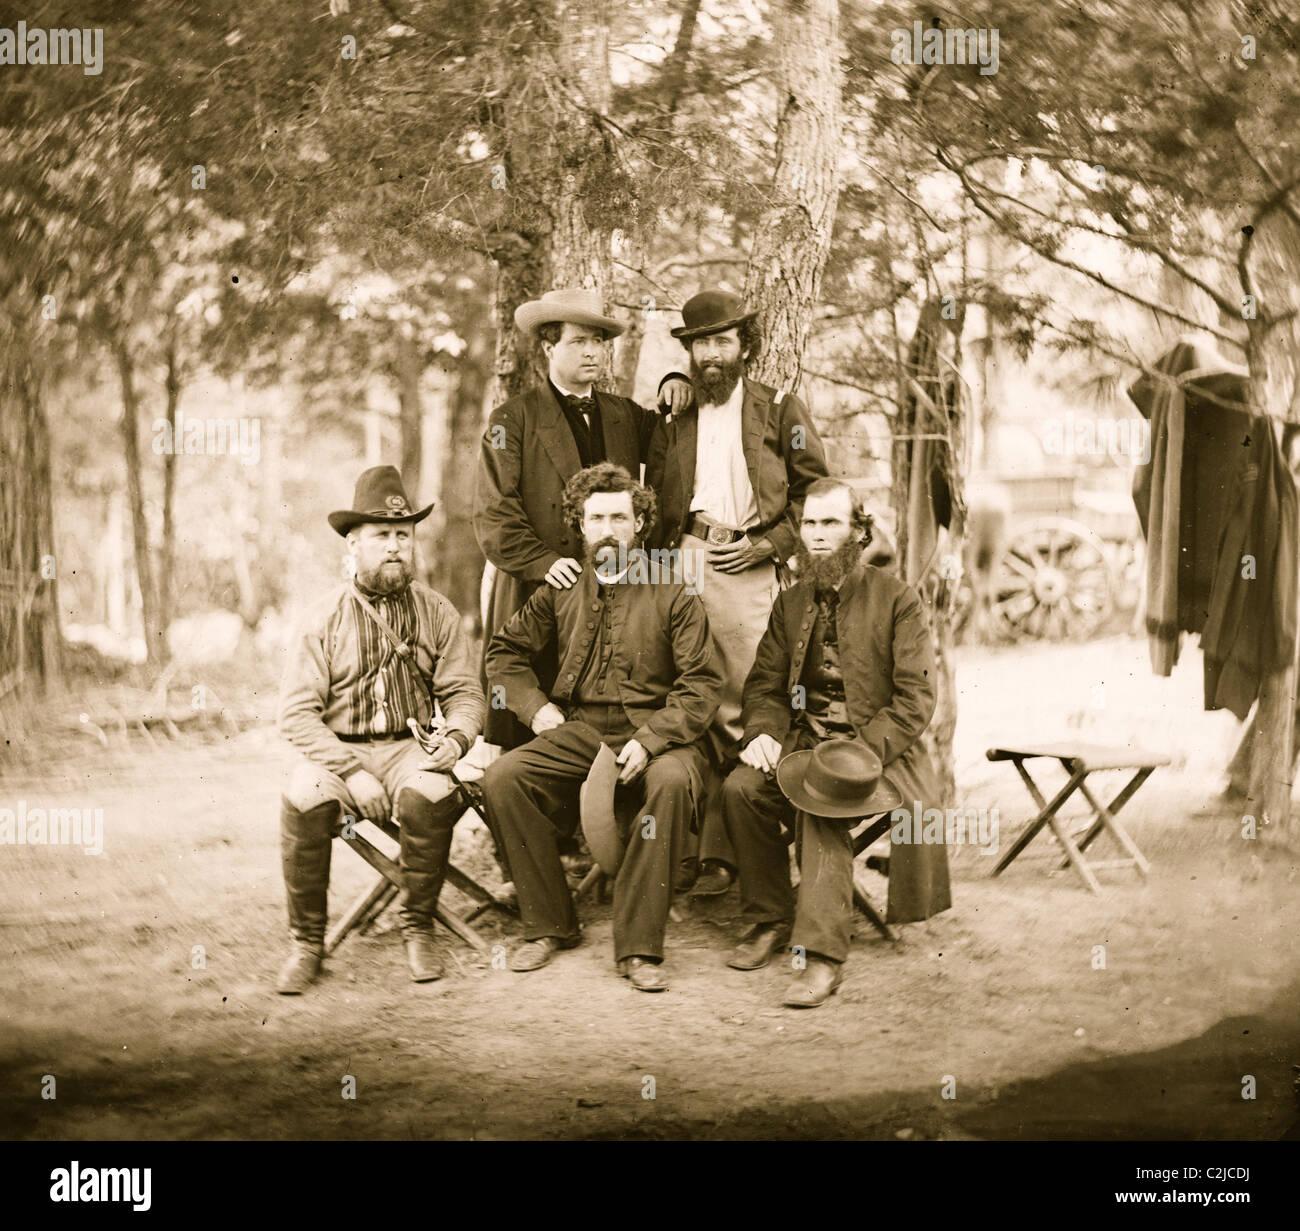 Men of the Irish Brigade - Stock Image